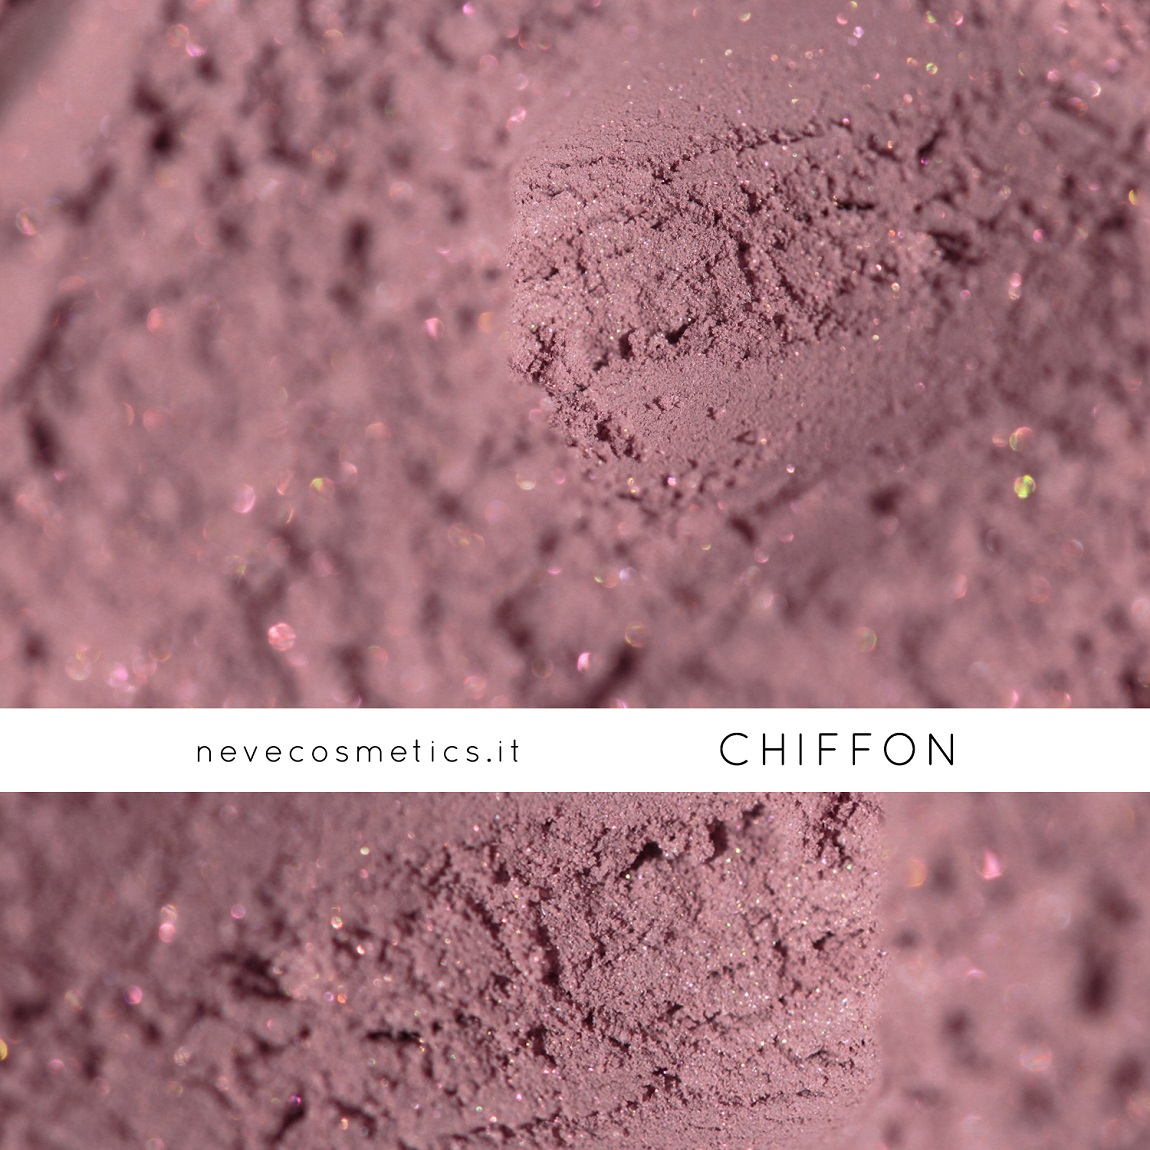 Mauve pink mineral eyeshadow : the beautiful Chiffon by Neve Cosmetics